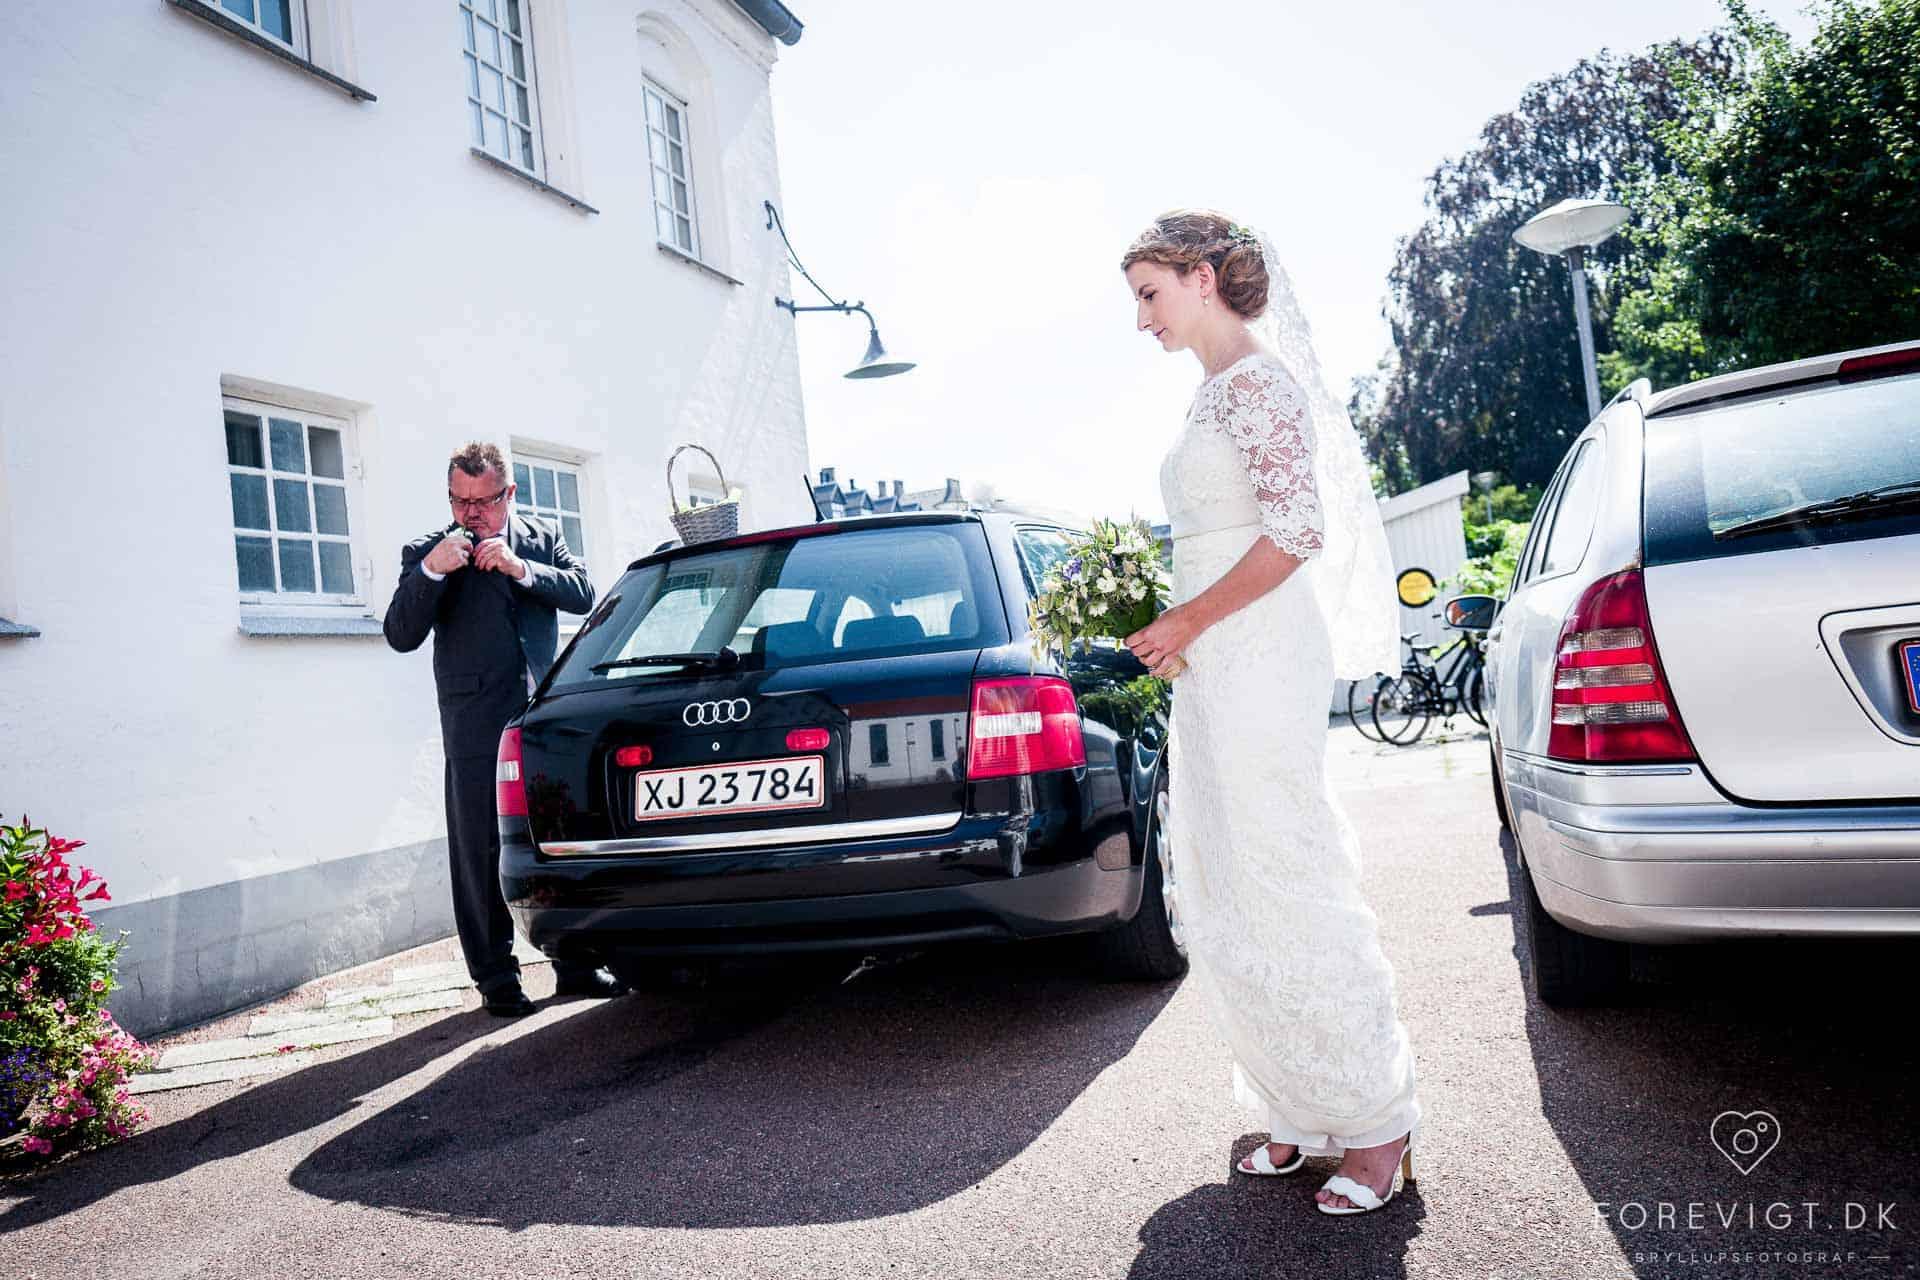 et bryllup i Filips Kirke på Amager